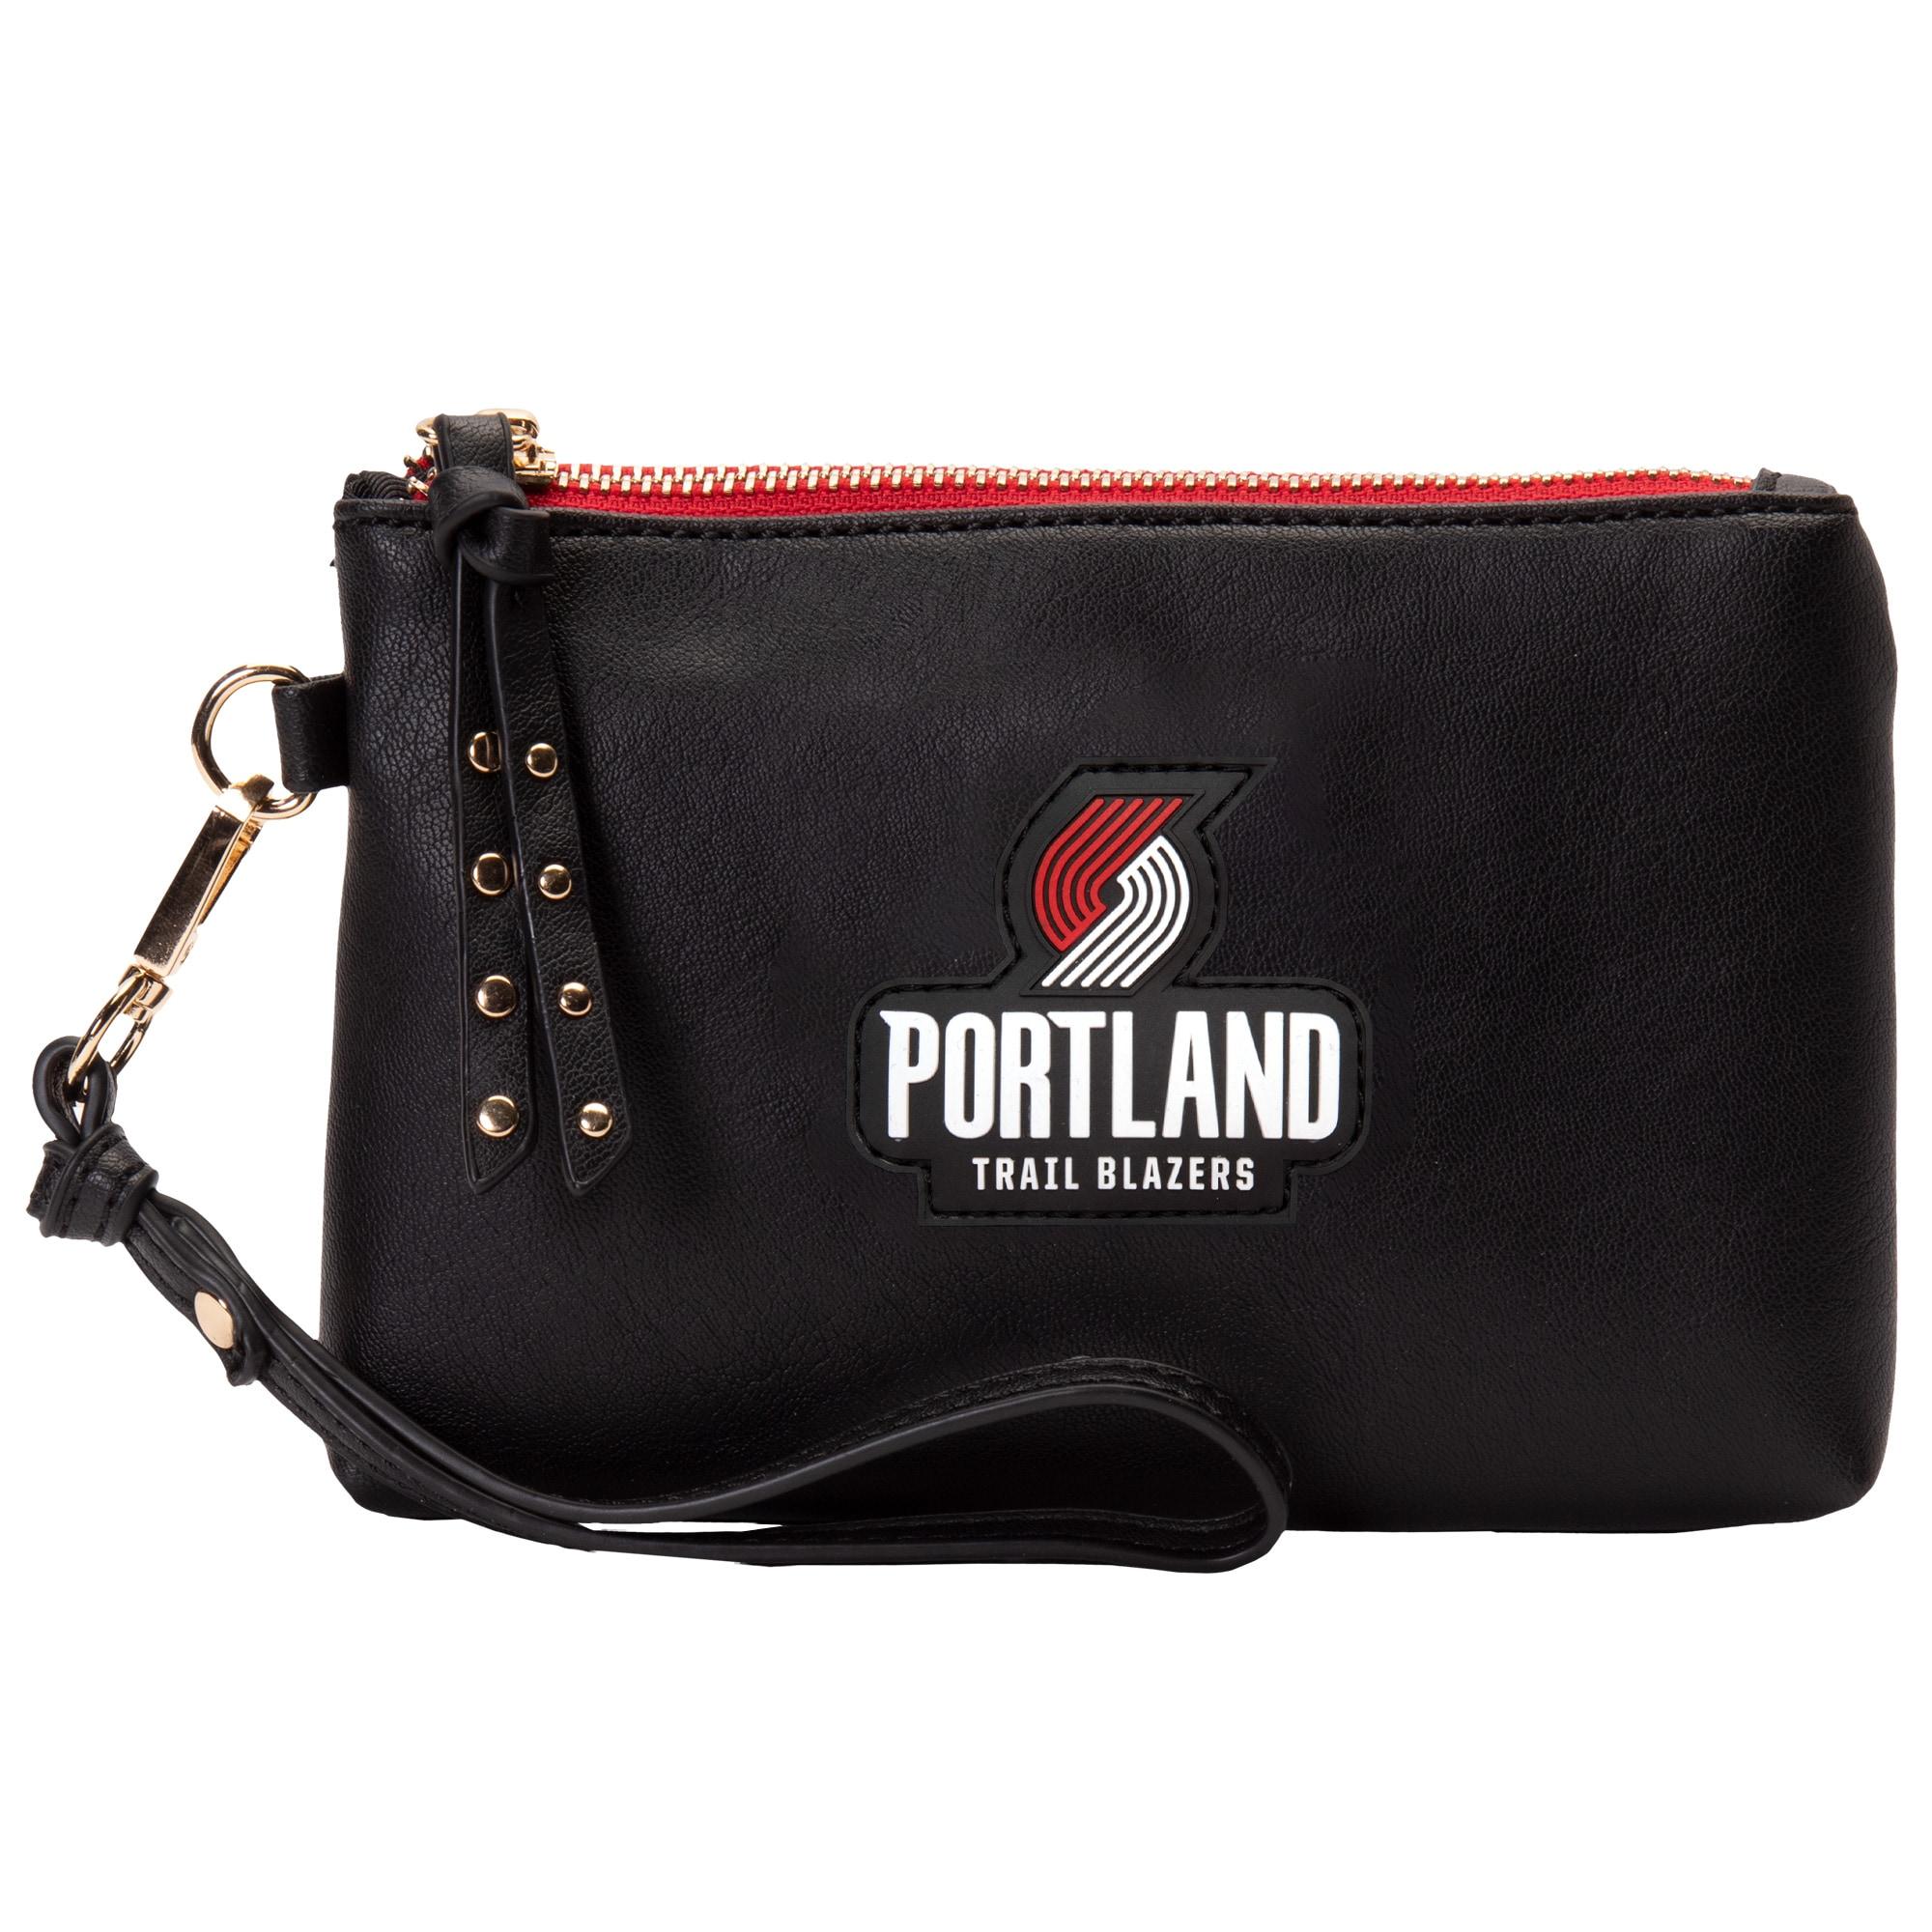 Portland Trail Blazers Wristlet Pouch